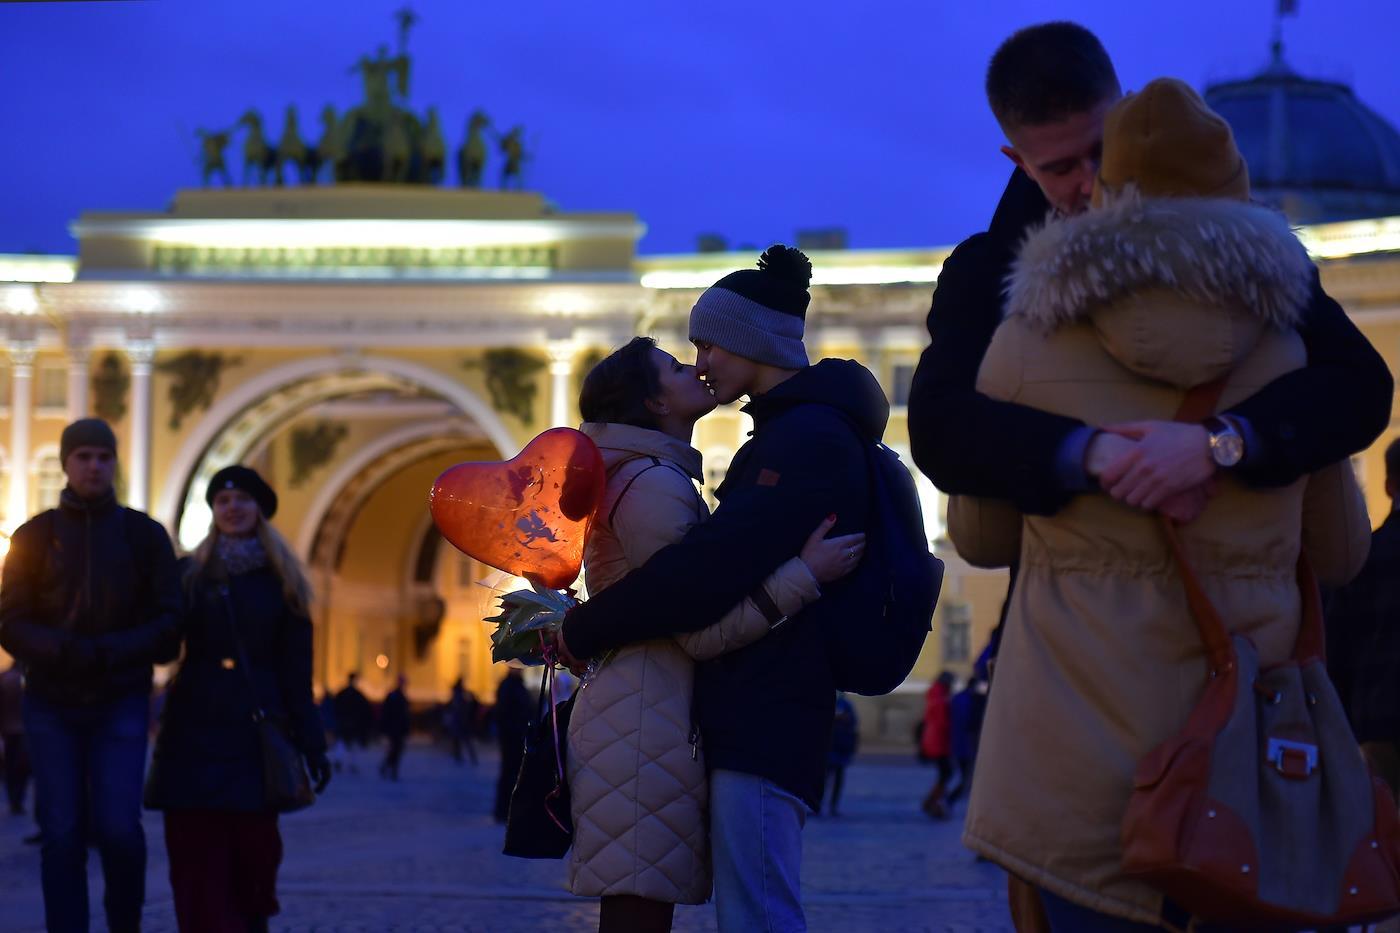 автор фото Александр Петросян / «Коммерсантъ»